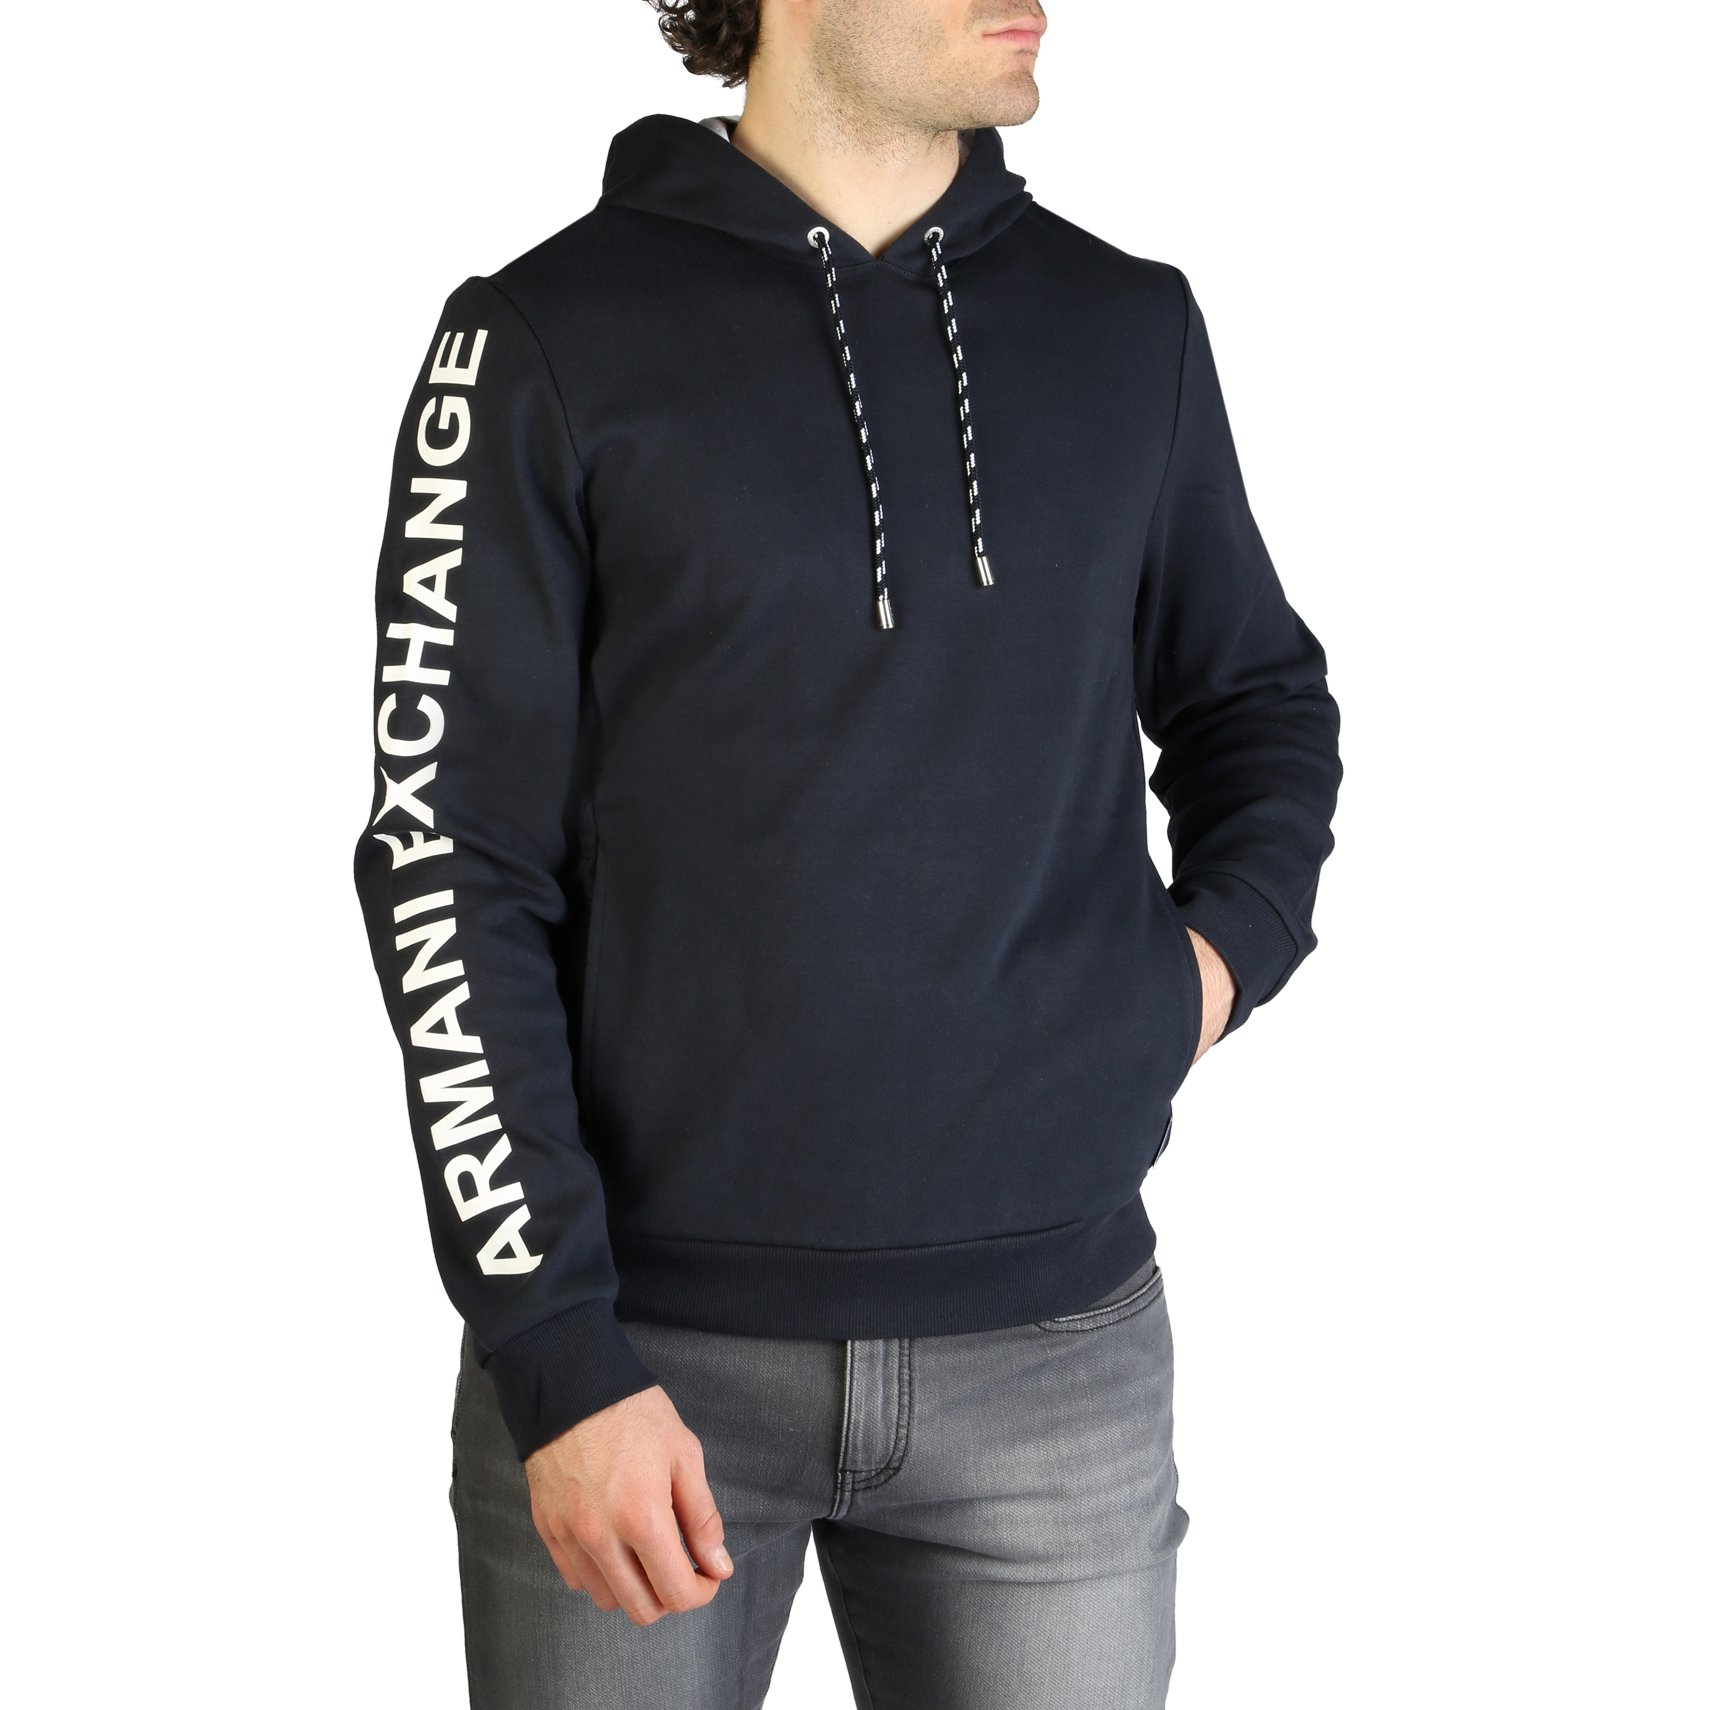 Armani Exchange Men's Sweatshirt Various Colours 3ZZM79_ZJR8Z - blue XXL